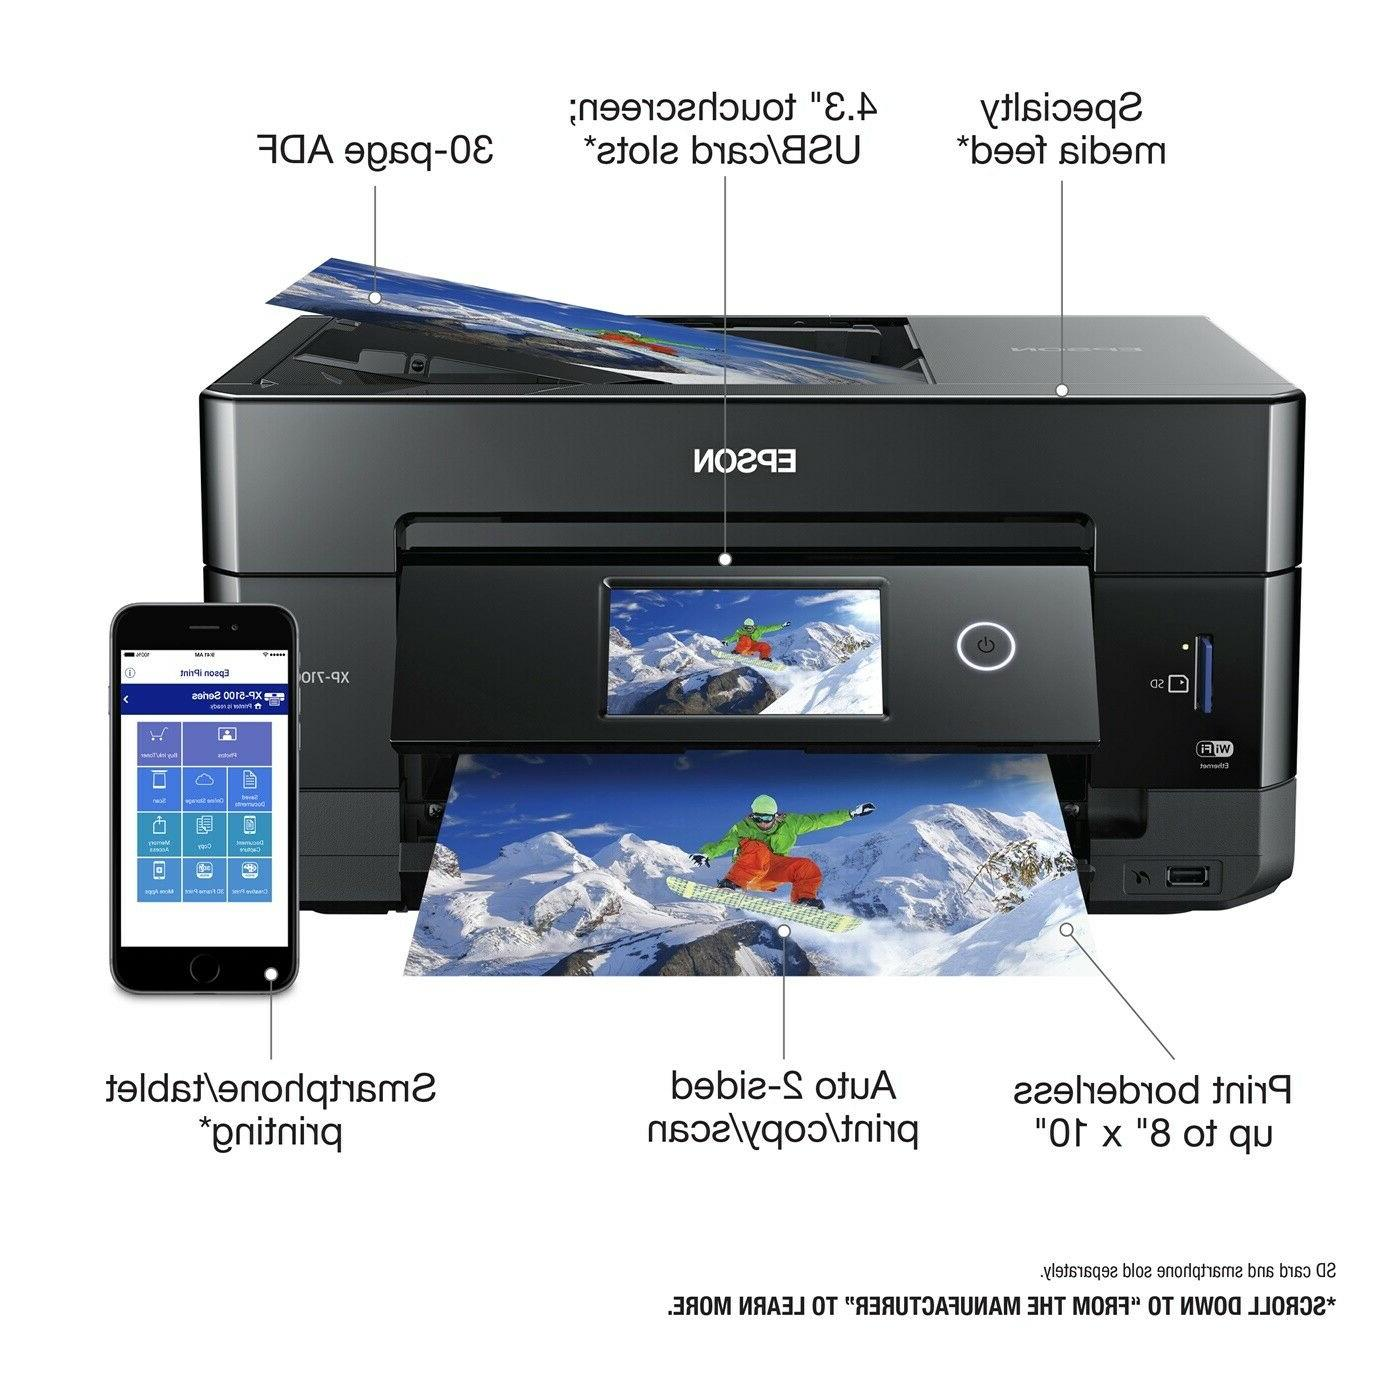 Epson Premium Wireless Photo Printer Black Scanner